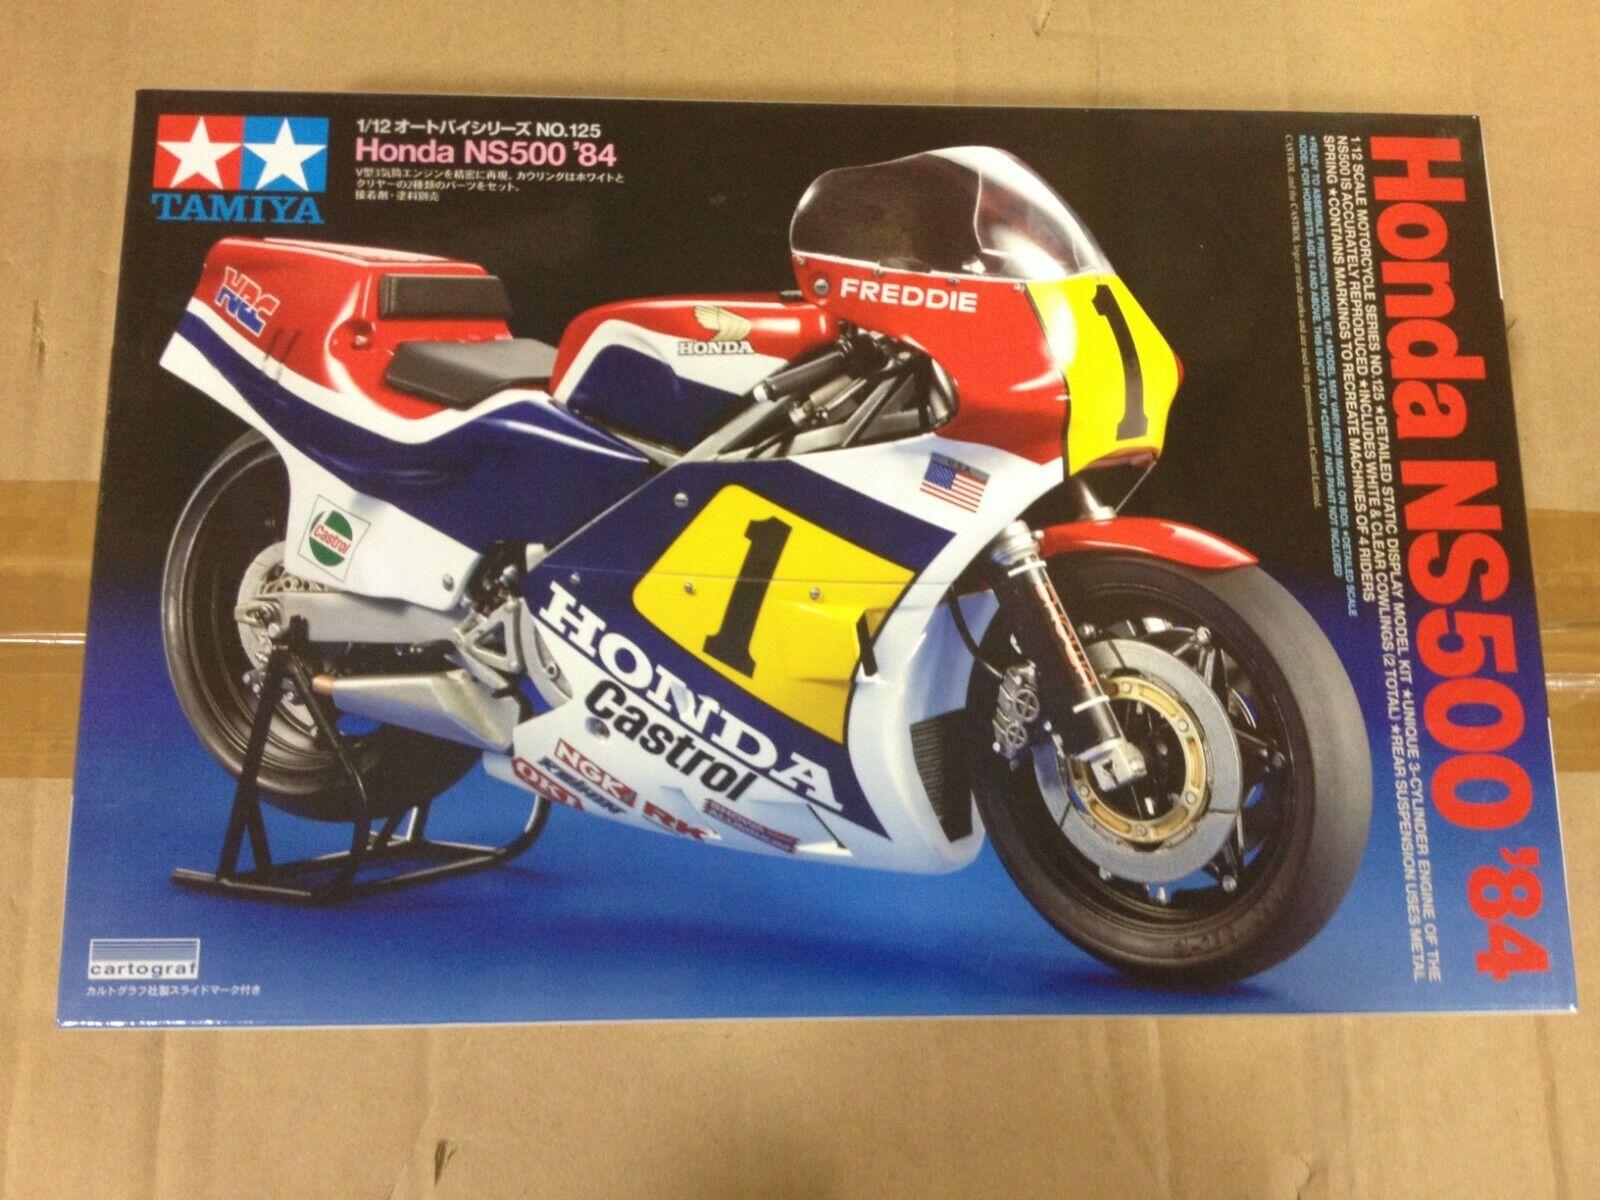 Maqueta Tamiya Honda NS500  84,Ref.14125,Escala 1 12